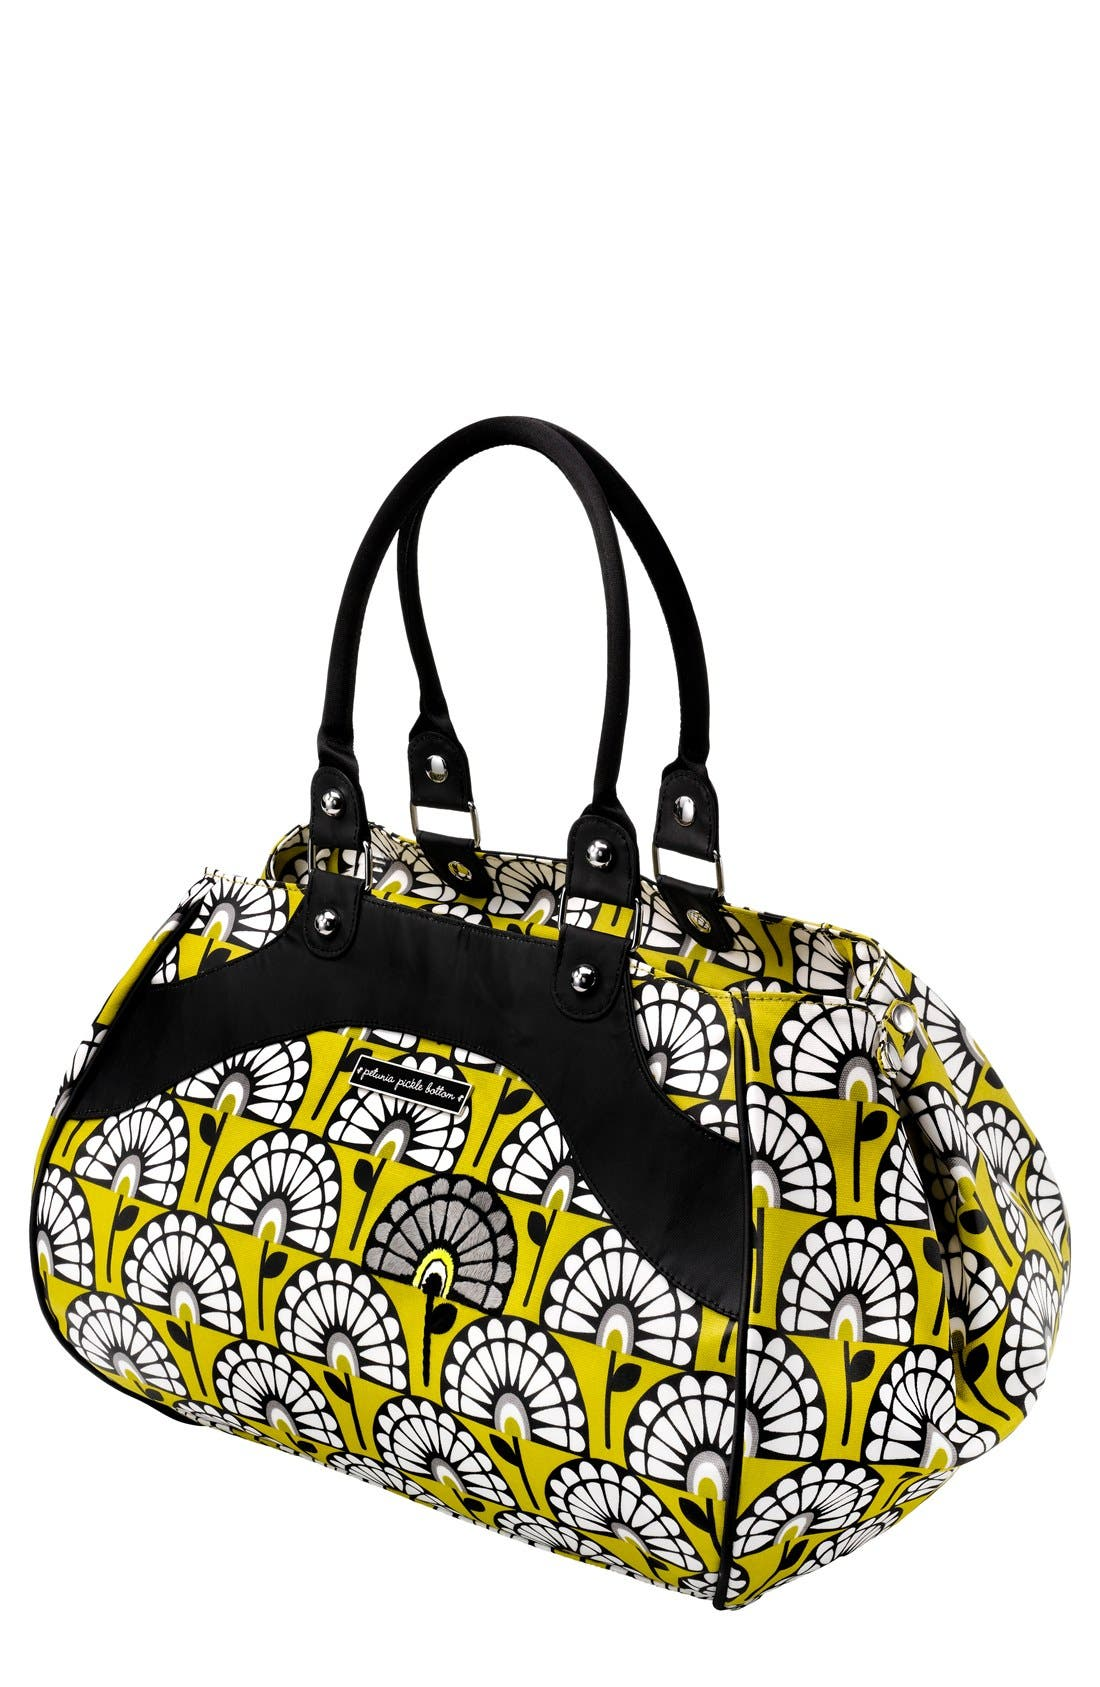 Alternate Image 1 Selected - Petunia Pickle Bottom 'Wistful Weekend' Diaper Bag